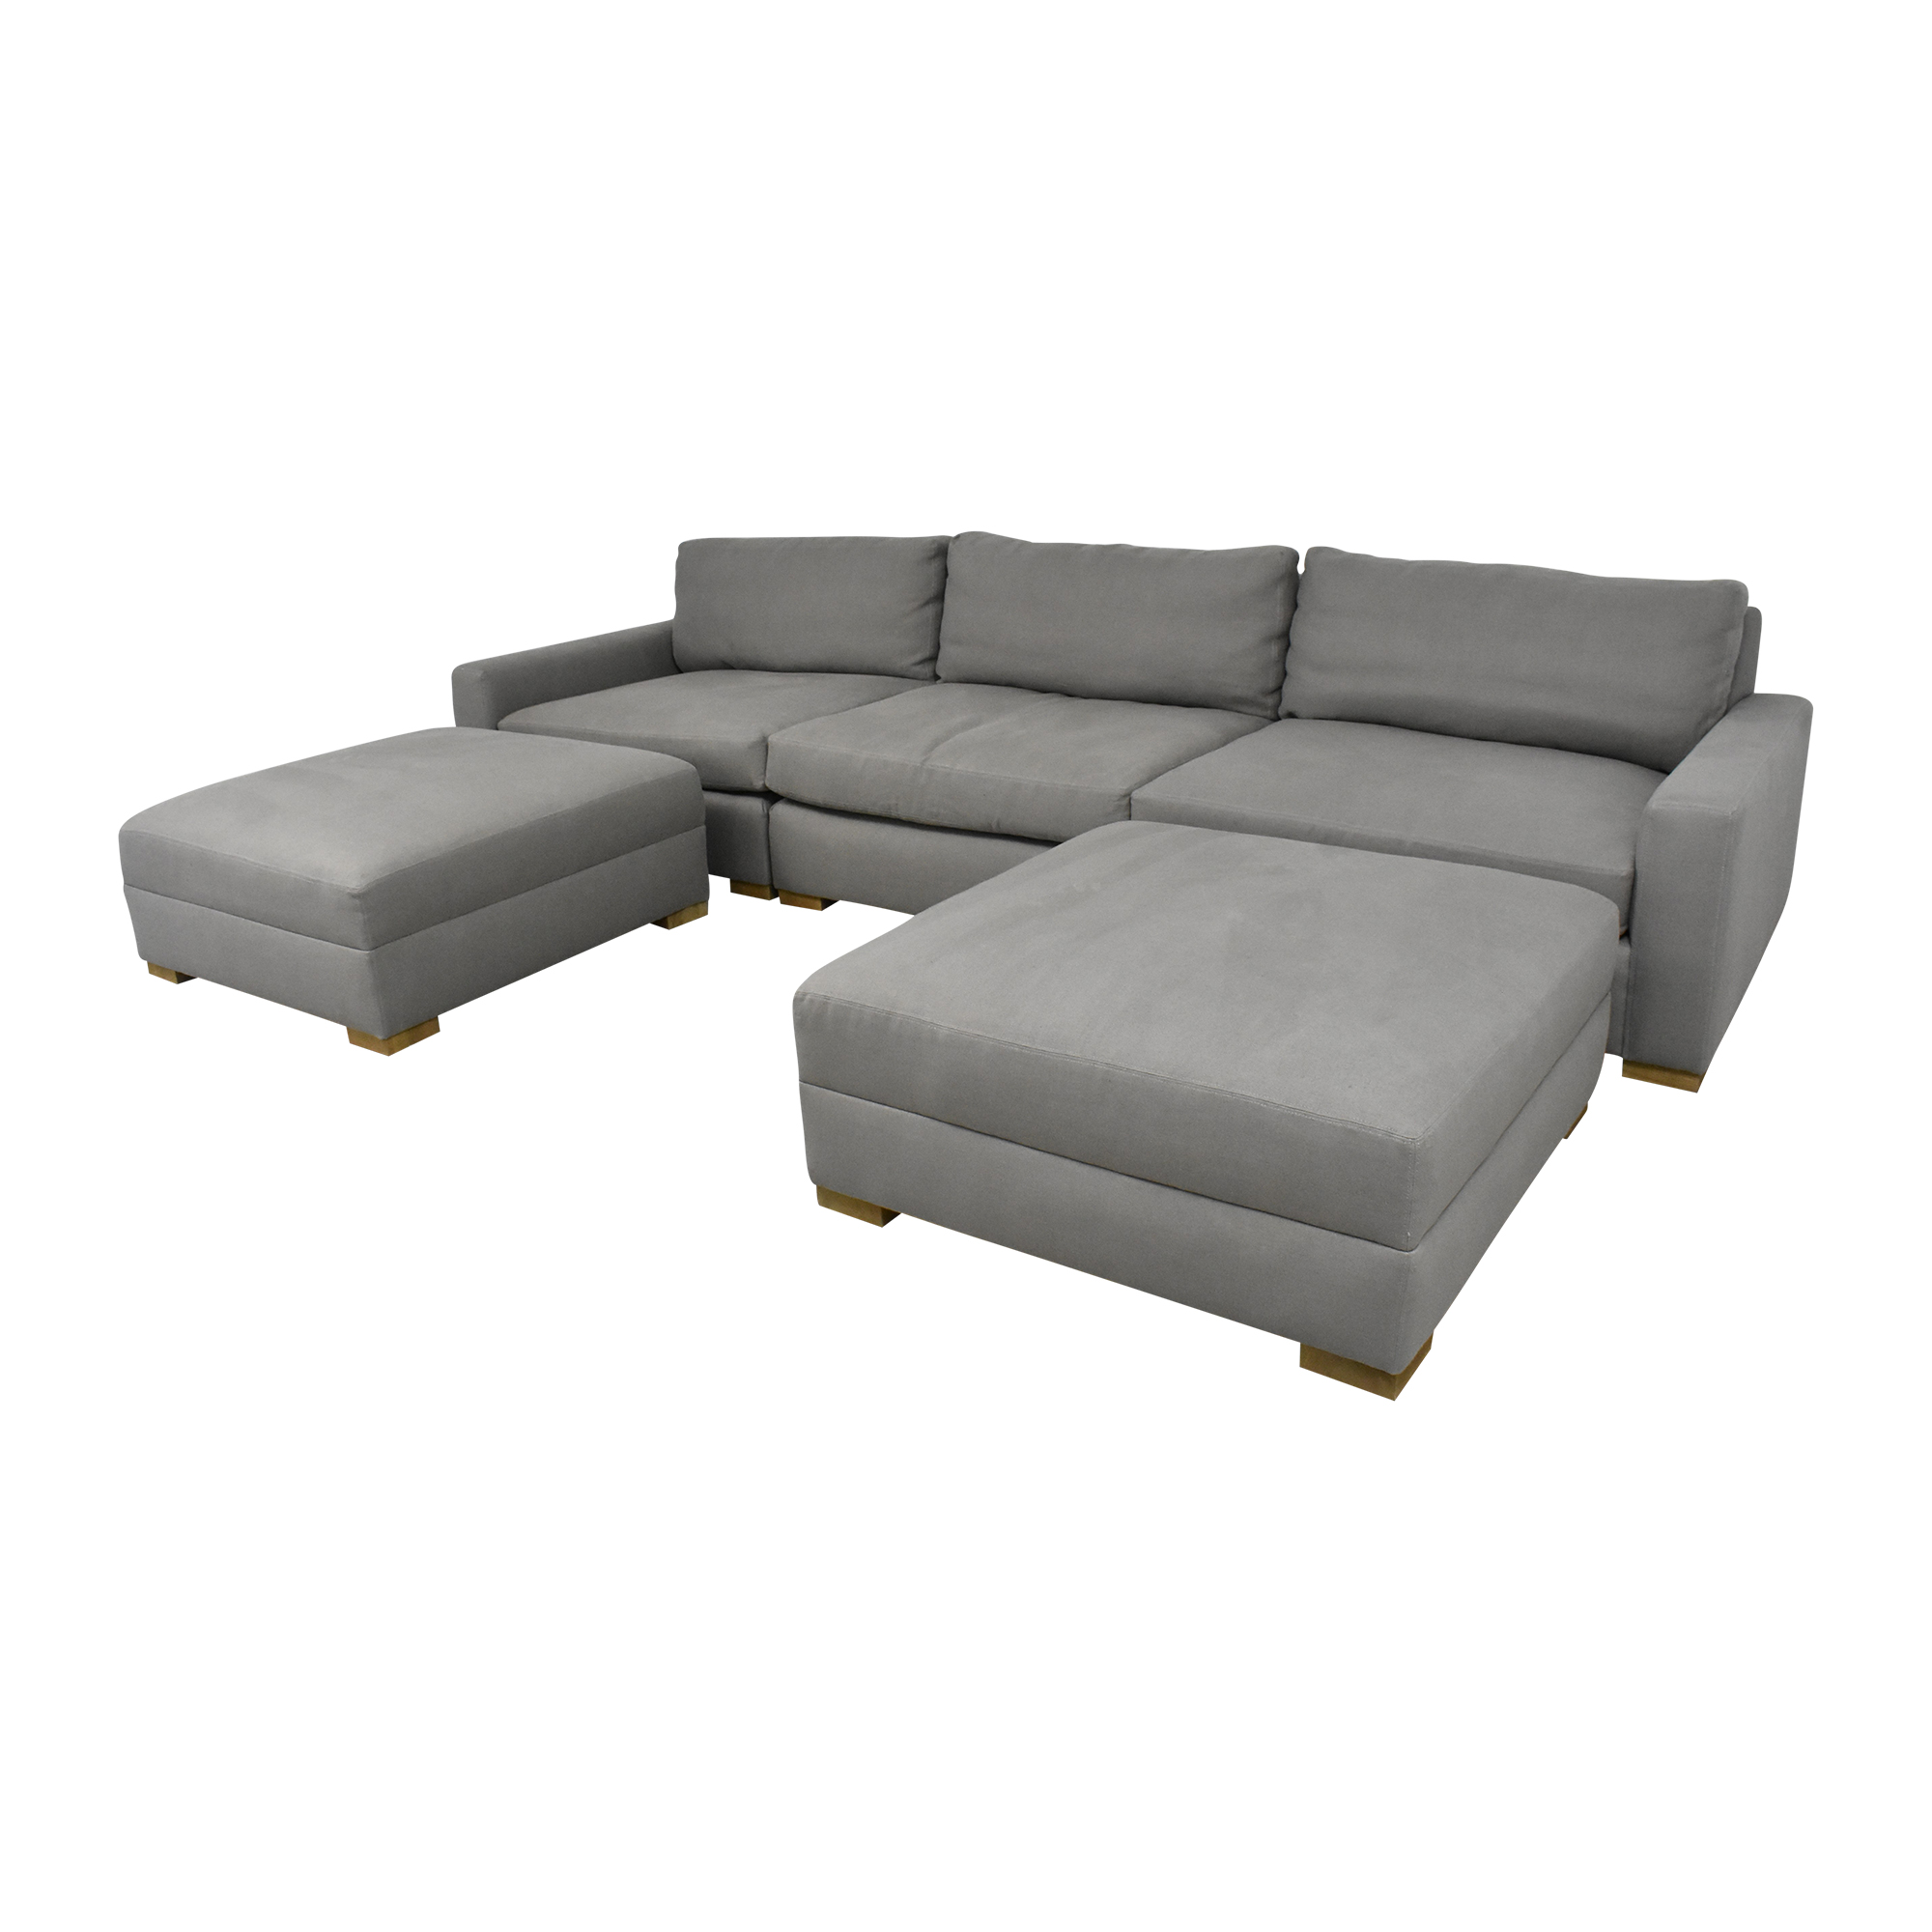 Restoration Hardware Restoration Hardware Maxwell Modular Sofa with Ottomans grey